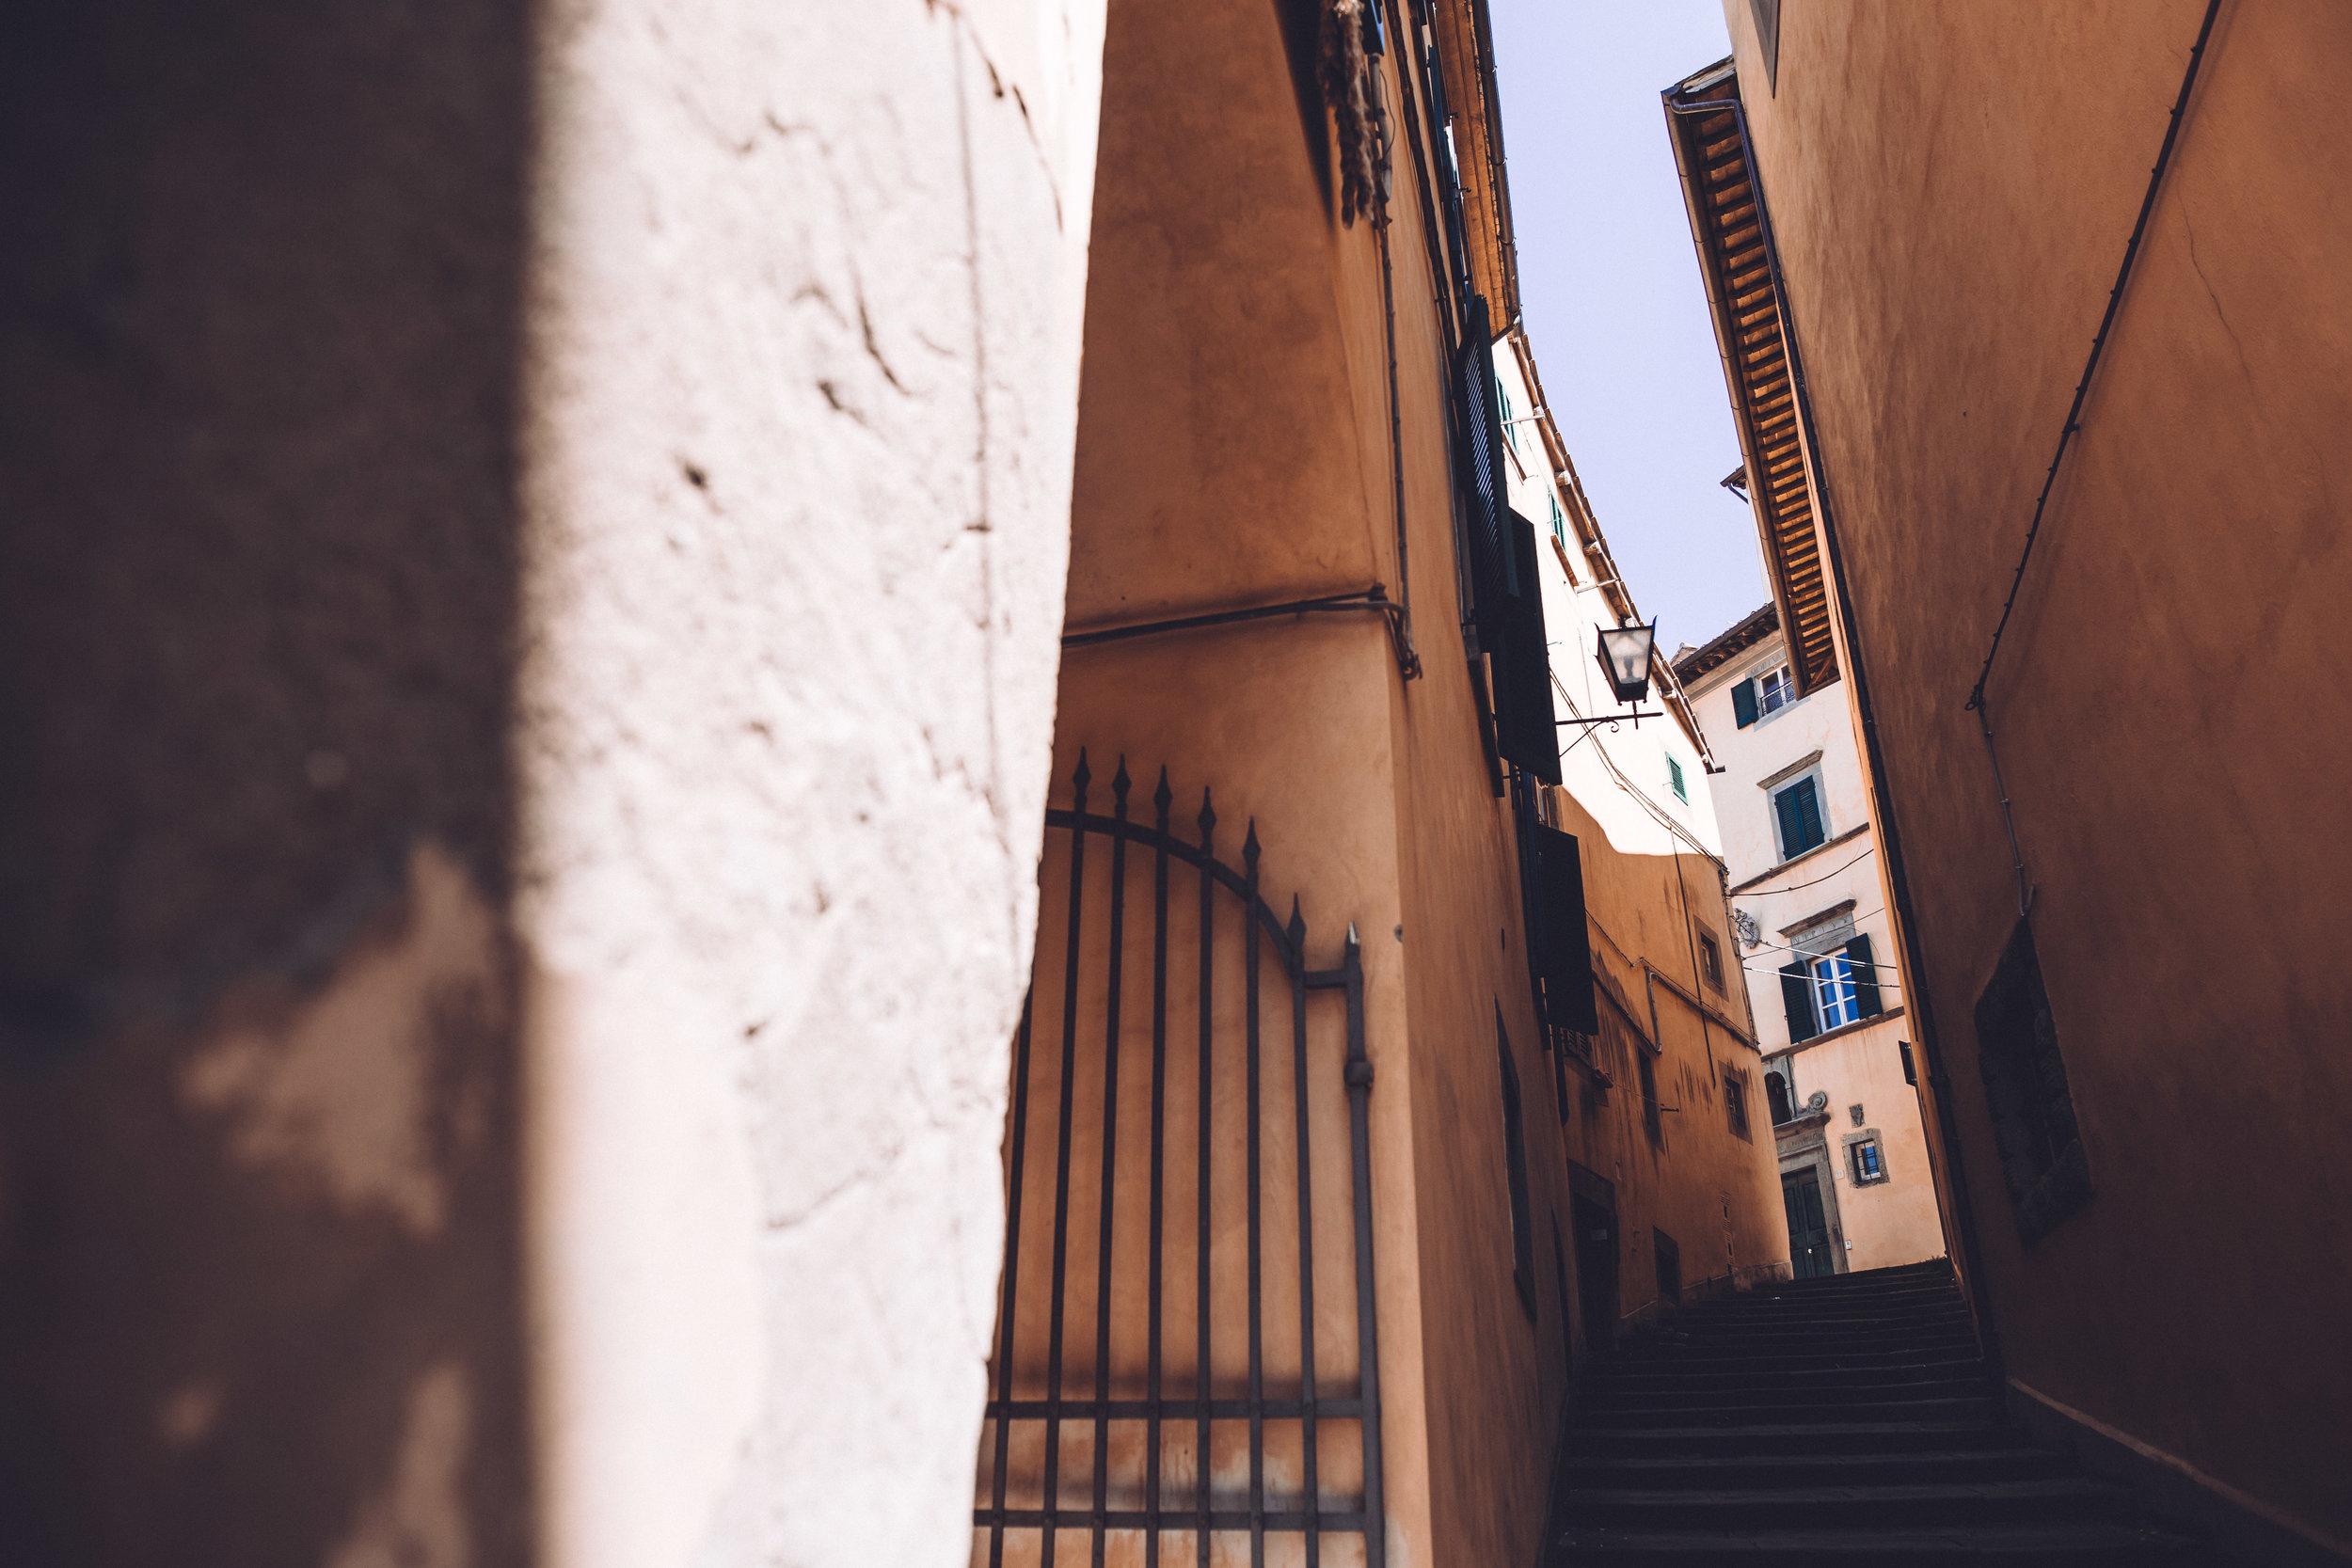 villa-baroncino-3221.jpg